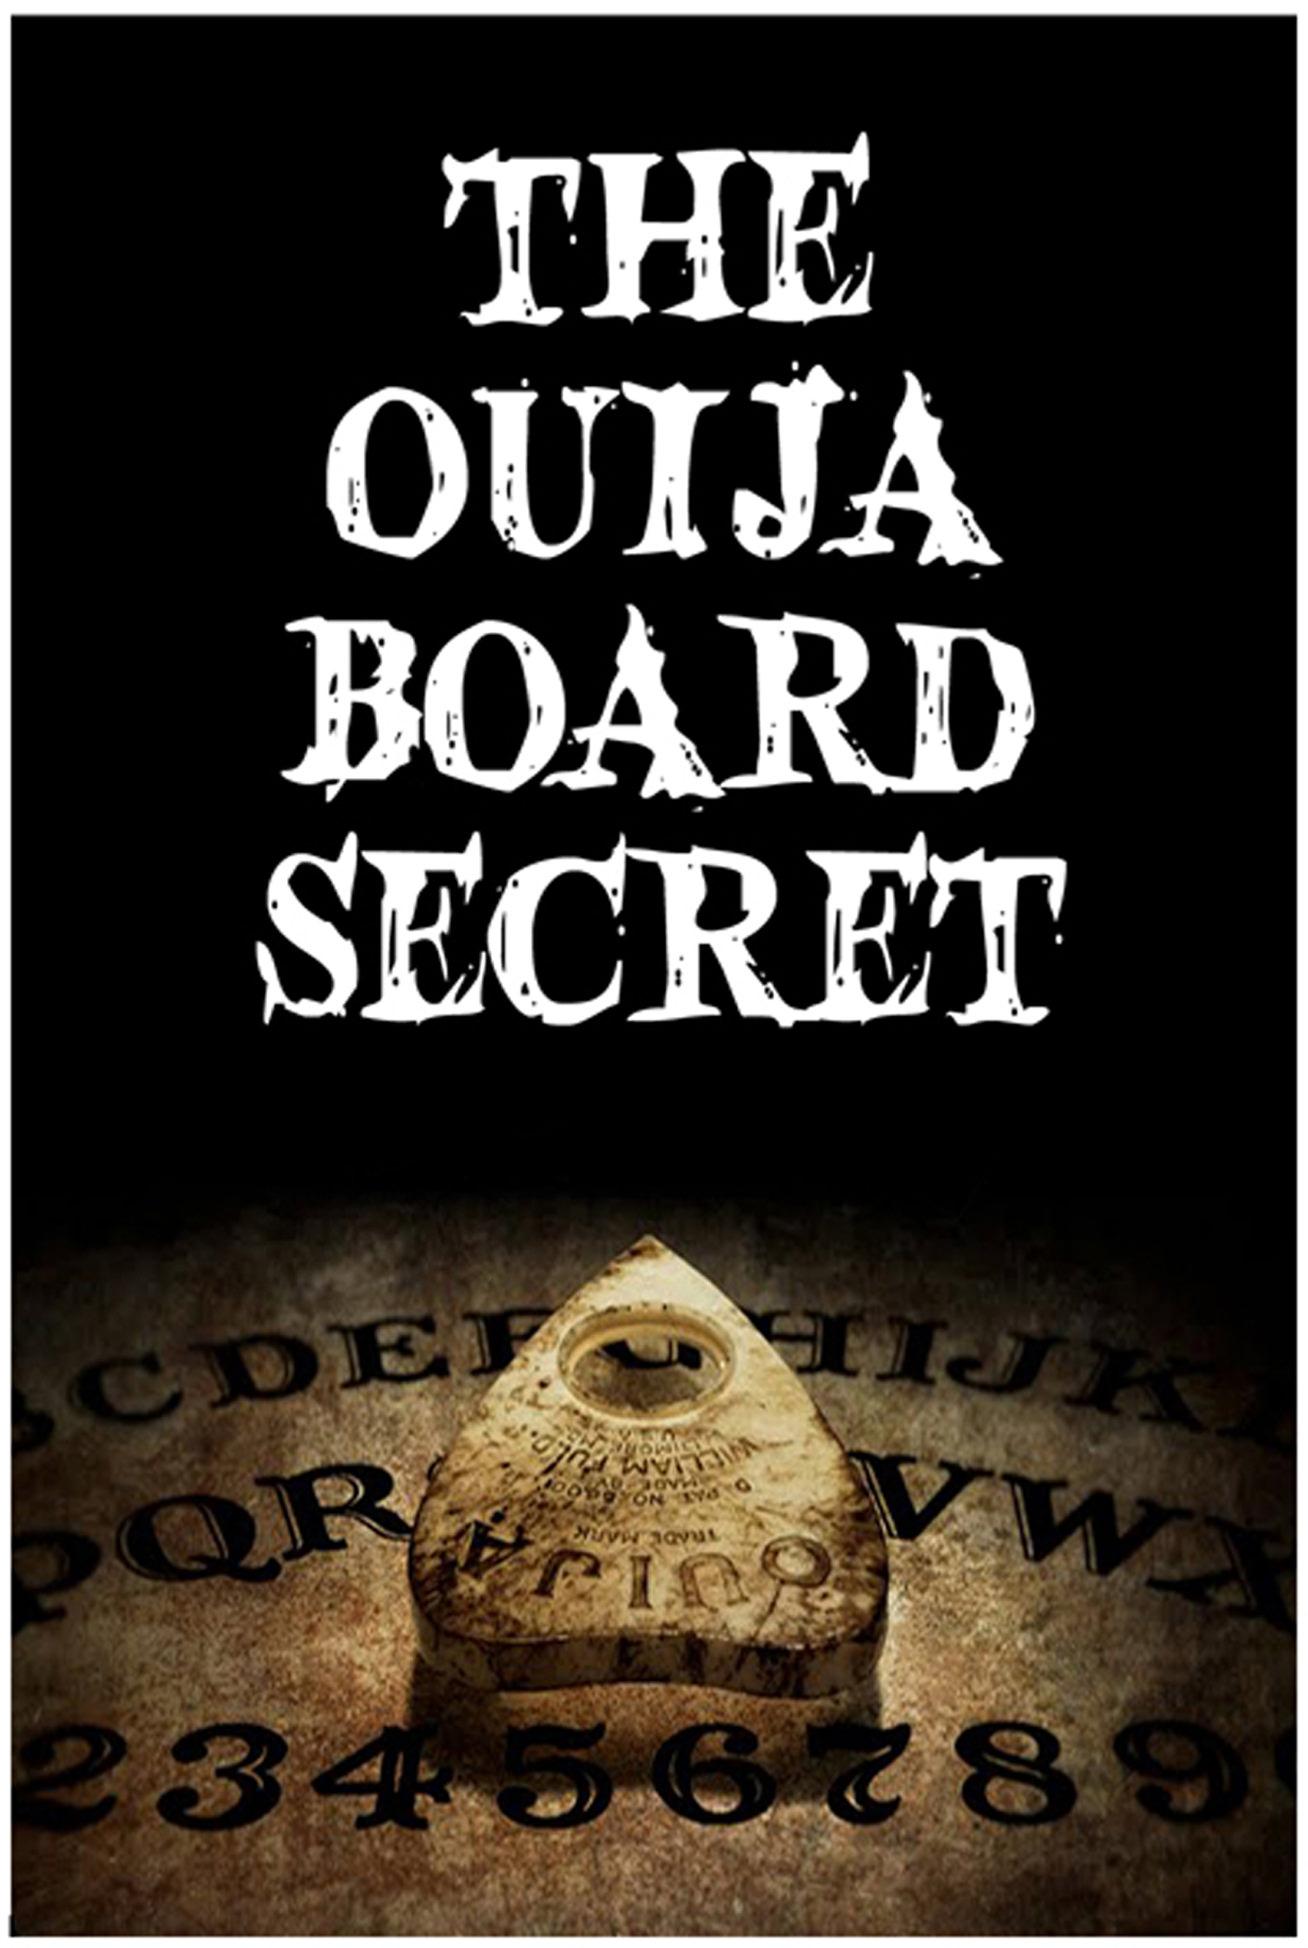 Andrea ricca the ouija board secret - La tavola ouija film ...